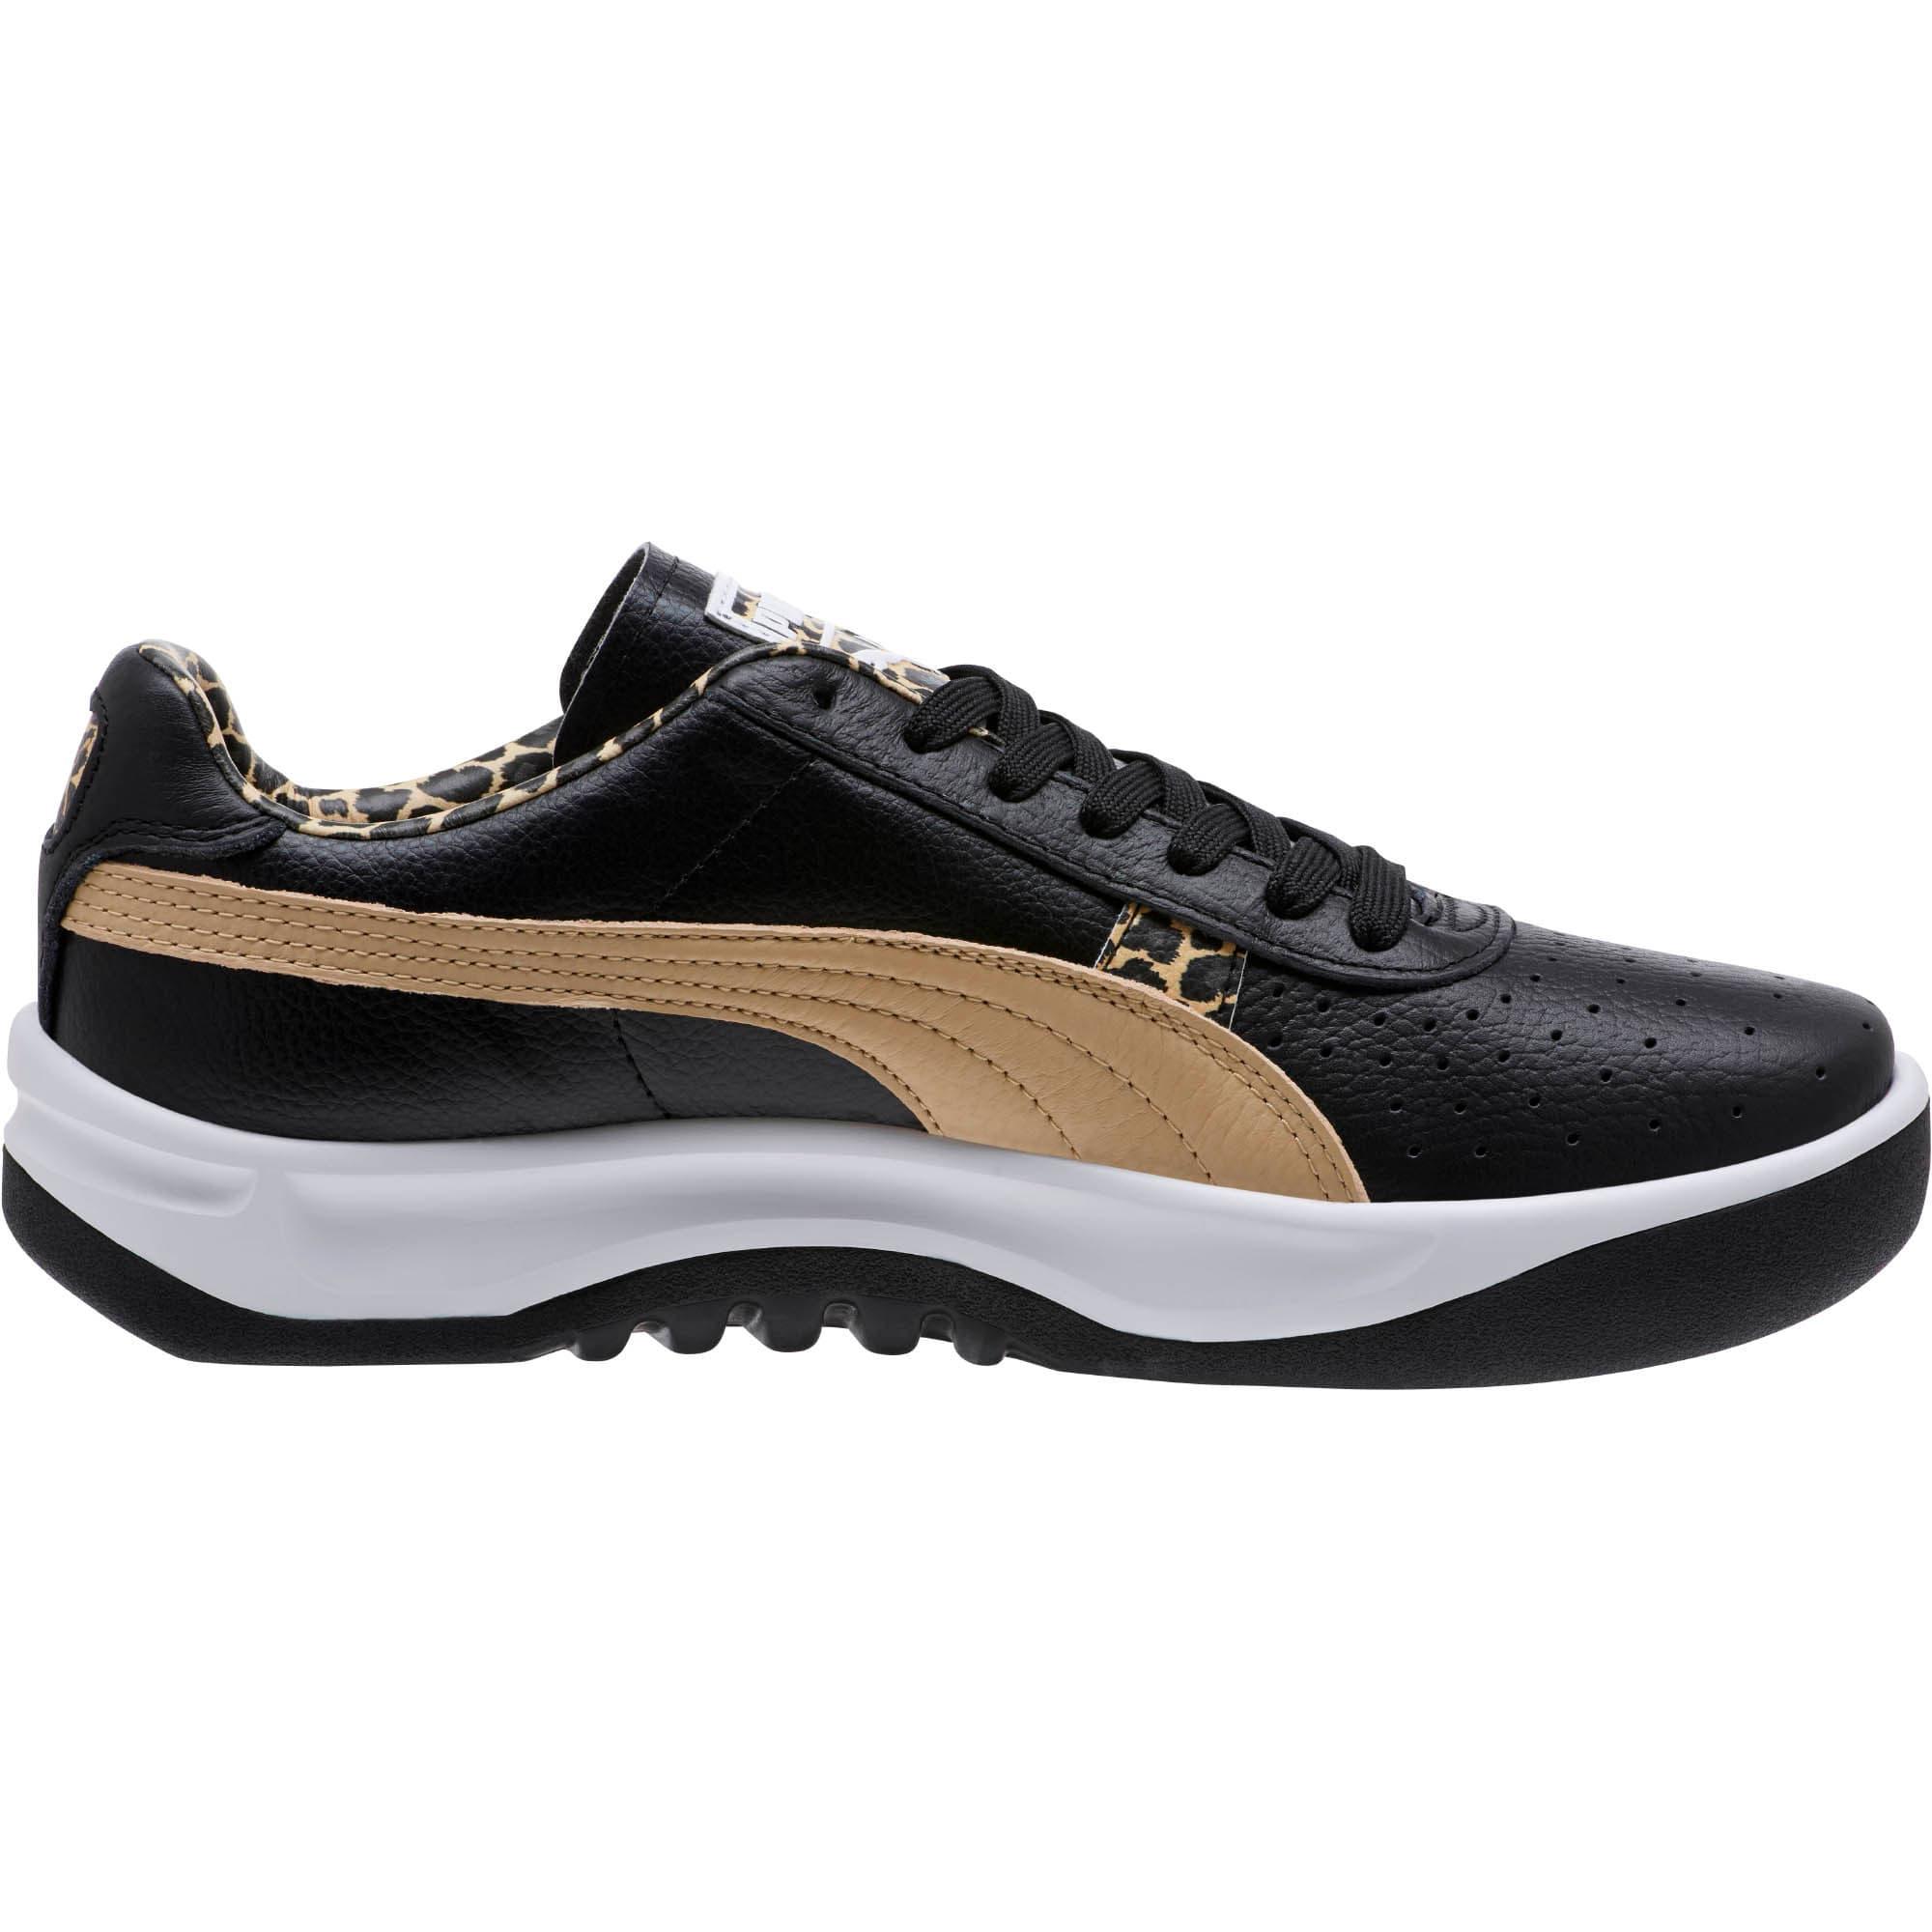 Thumbnail 3 of GV Special Wild Sneakers, Black-Pebble-Puma Team Gold, medium